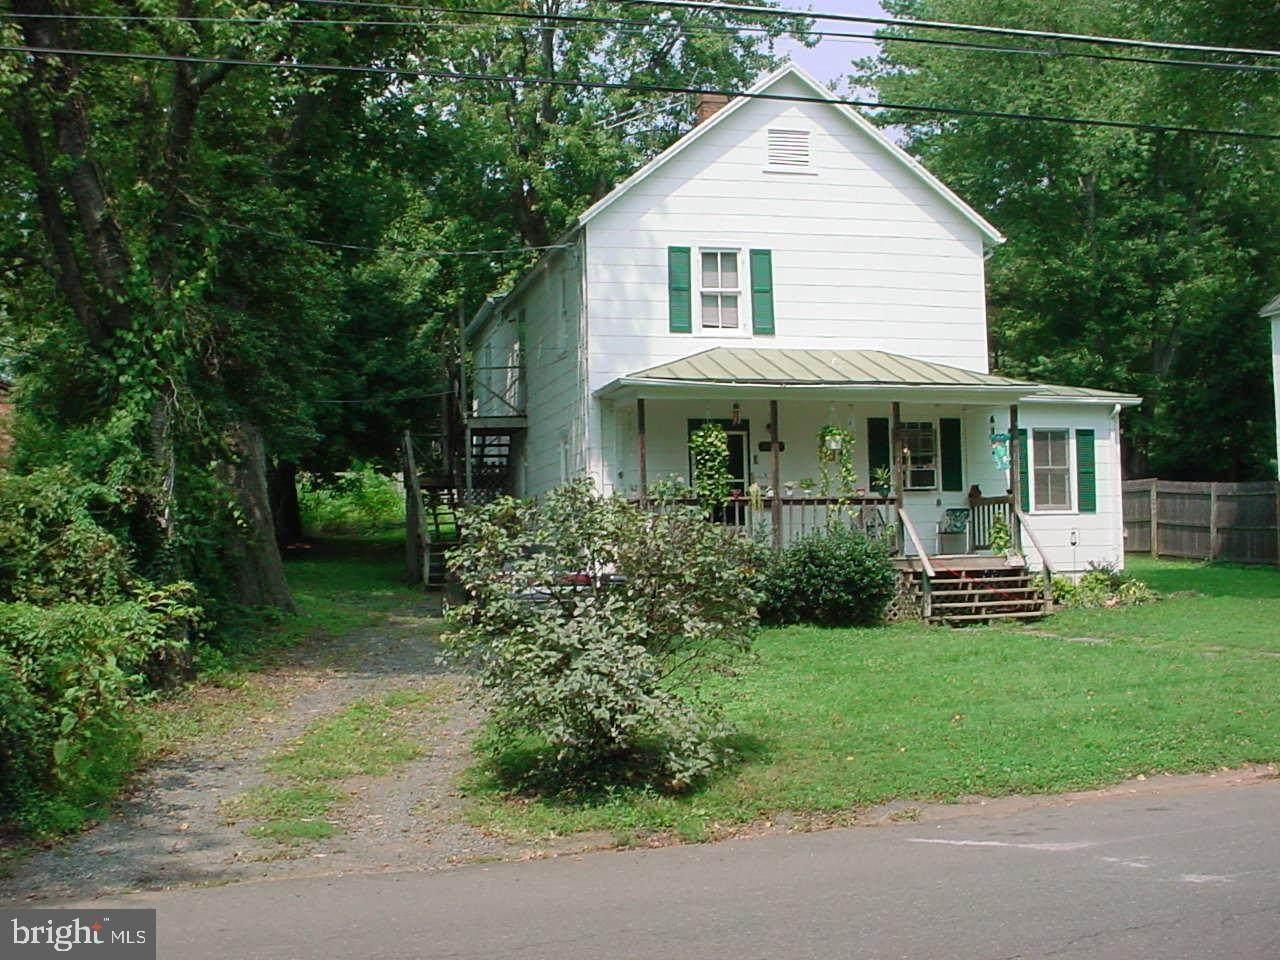 154 Green Street - Photo 1